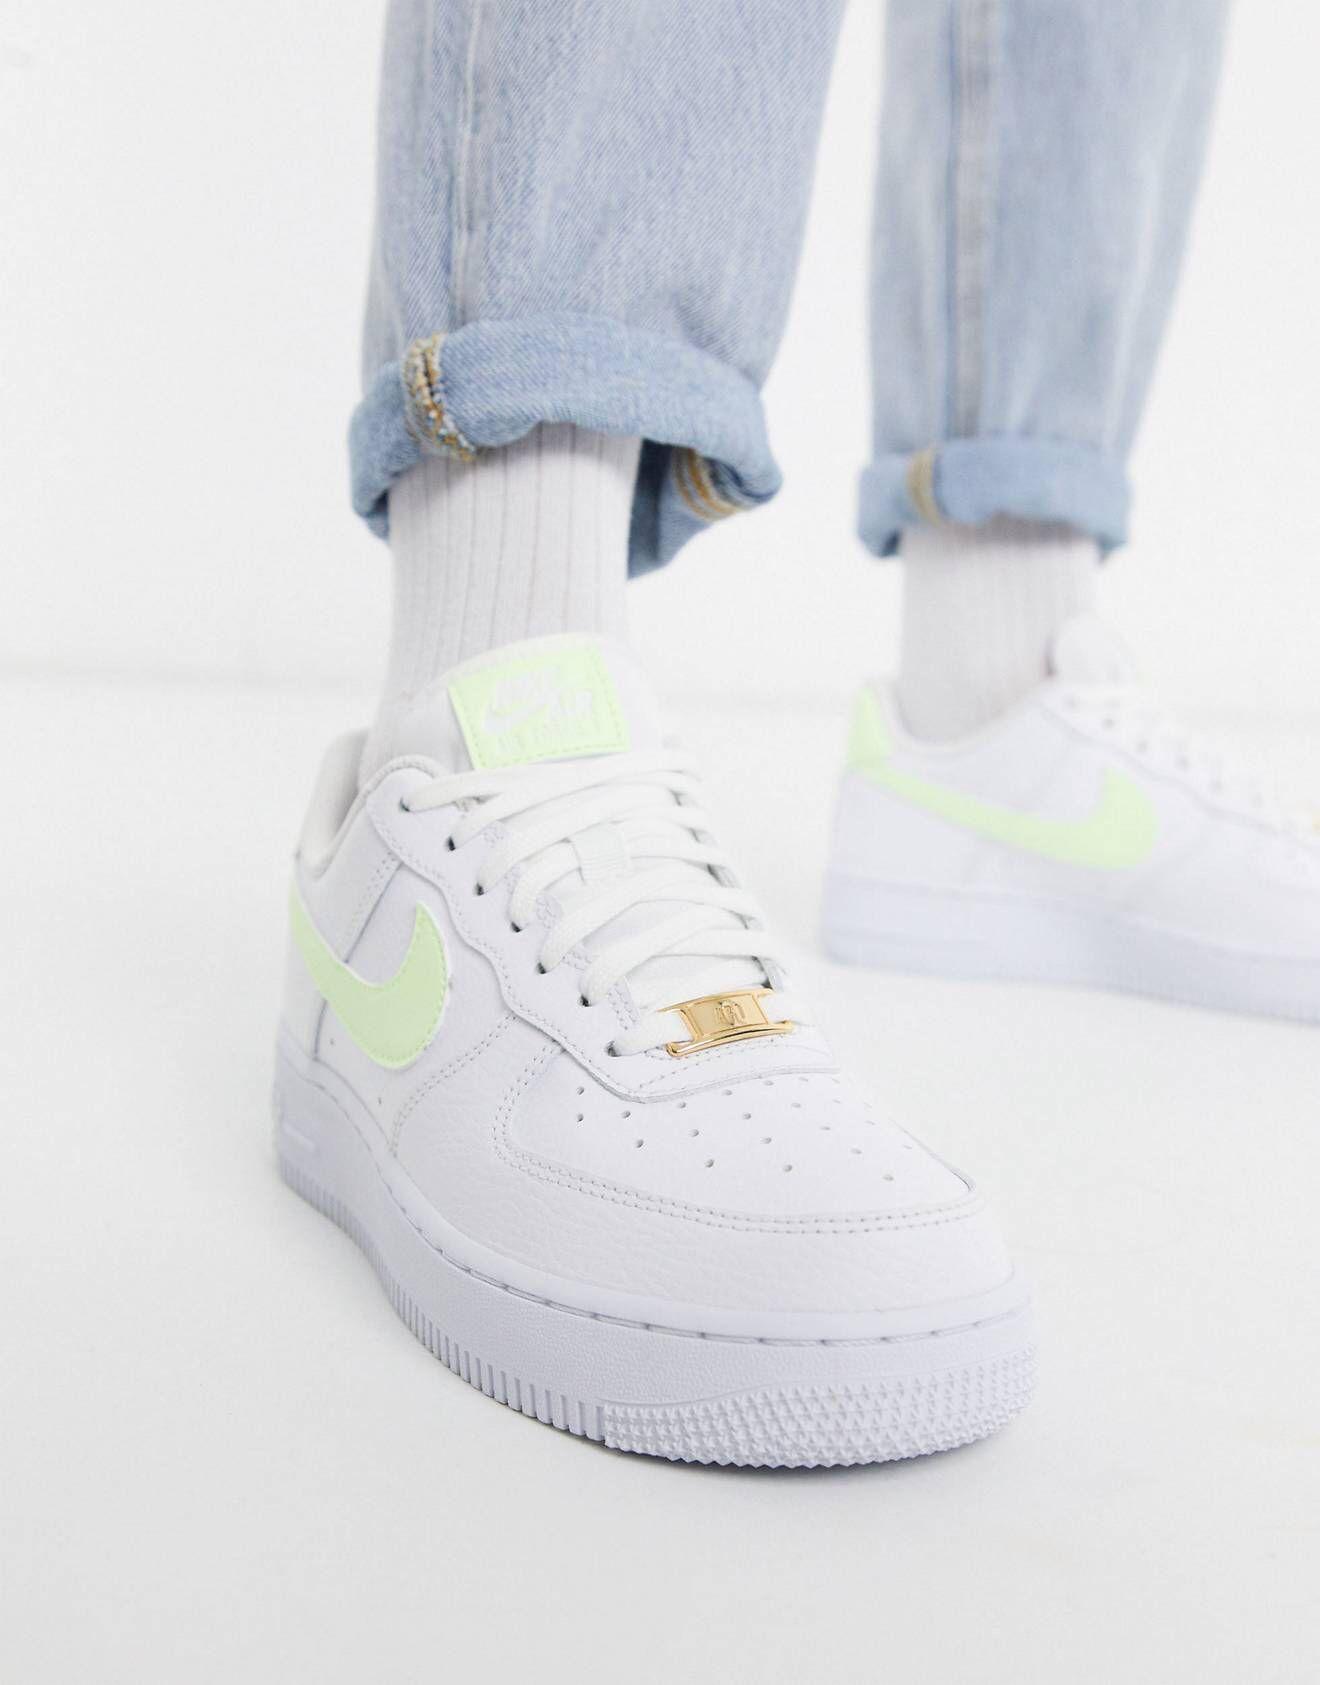 brindis Increíble cobija  Pin de Montse Leos Luevano en want   Nike air force blancas, Zapatos nike  air, Zapatos nike mujer